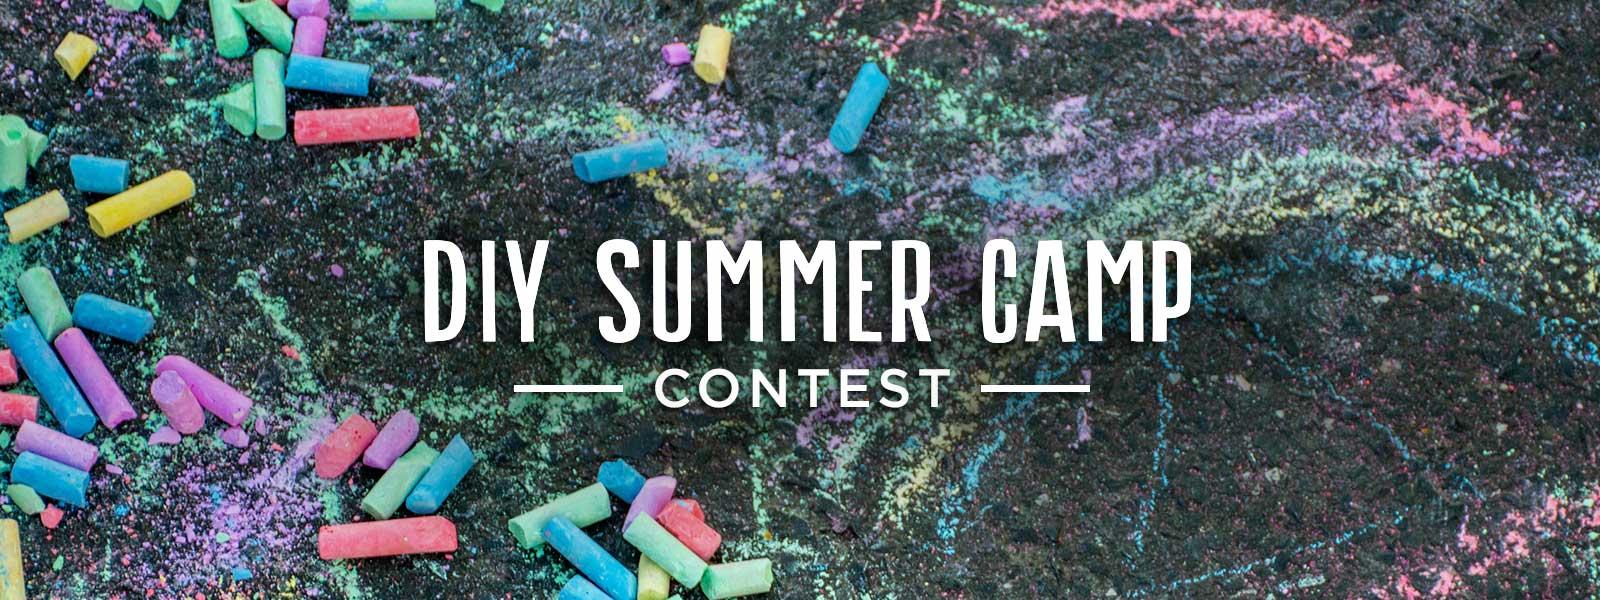 DIY Summer Camp Contest